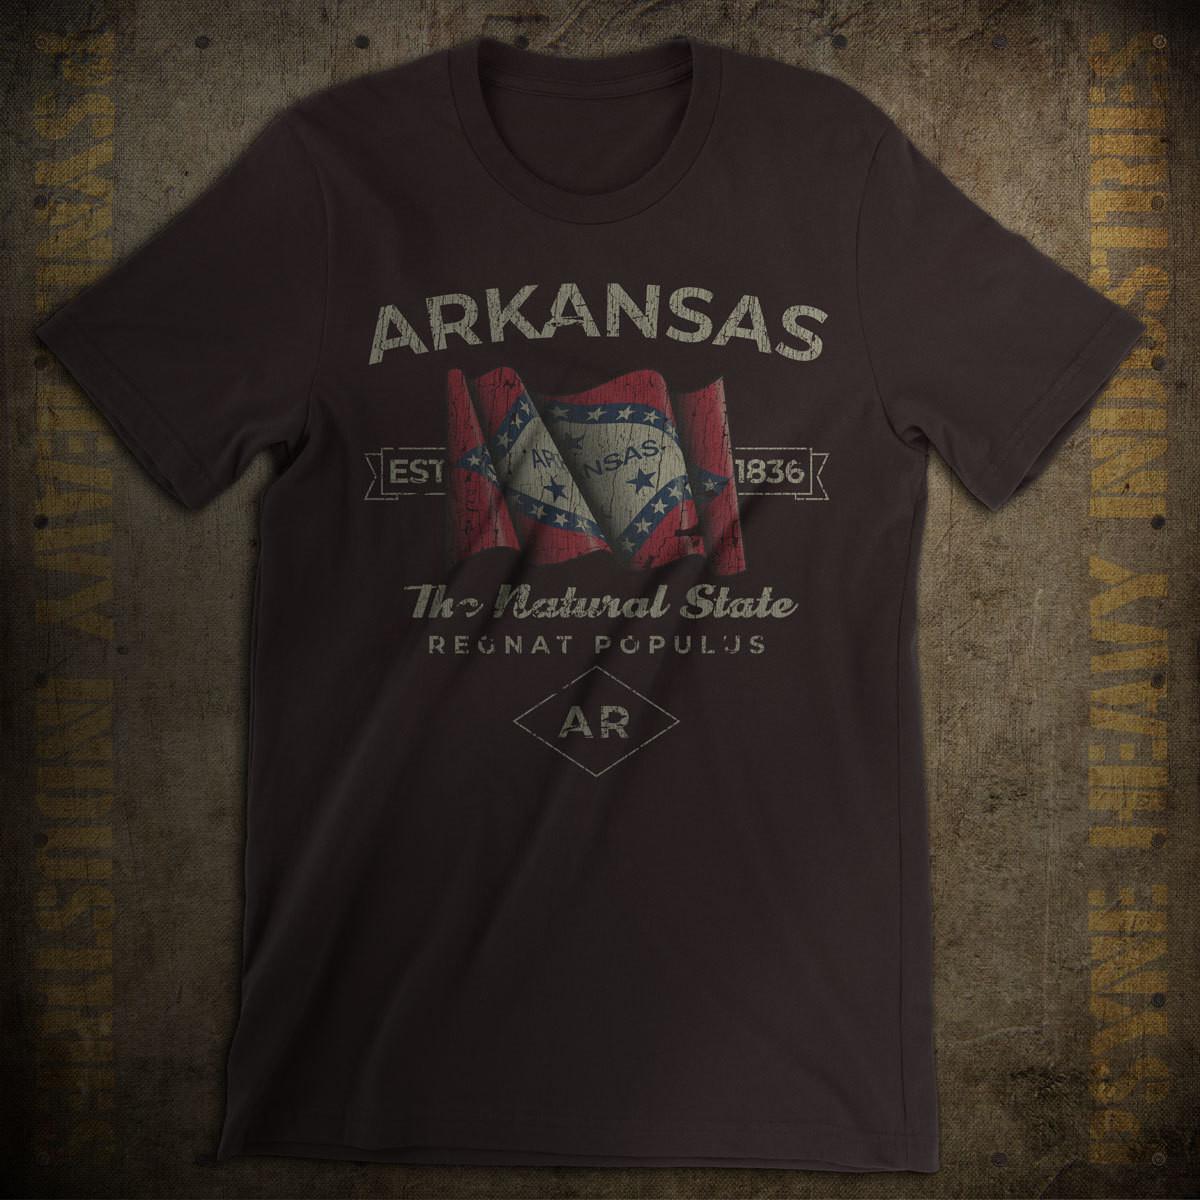 Arkansas 1836 Vintage T-Shirt